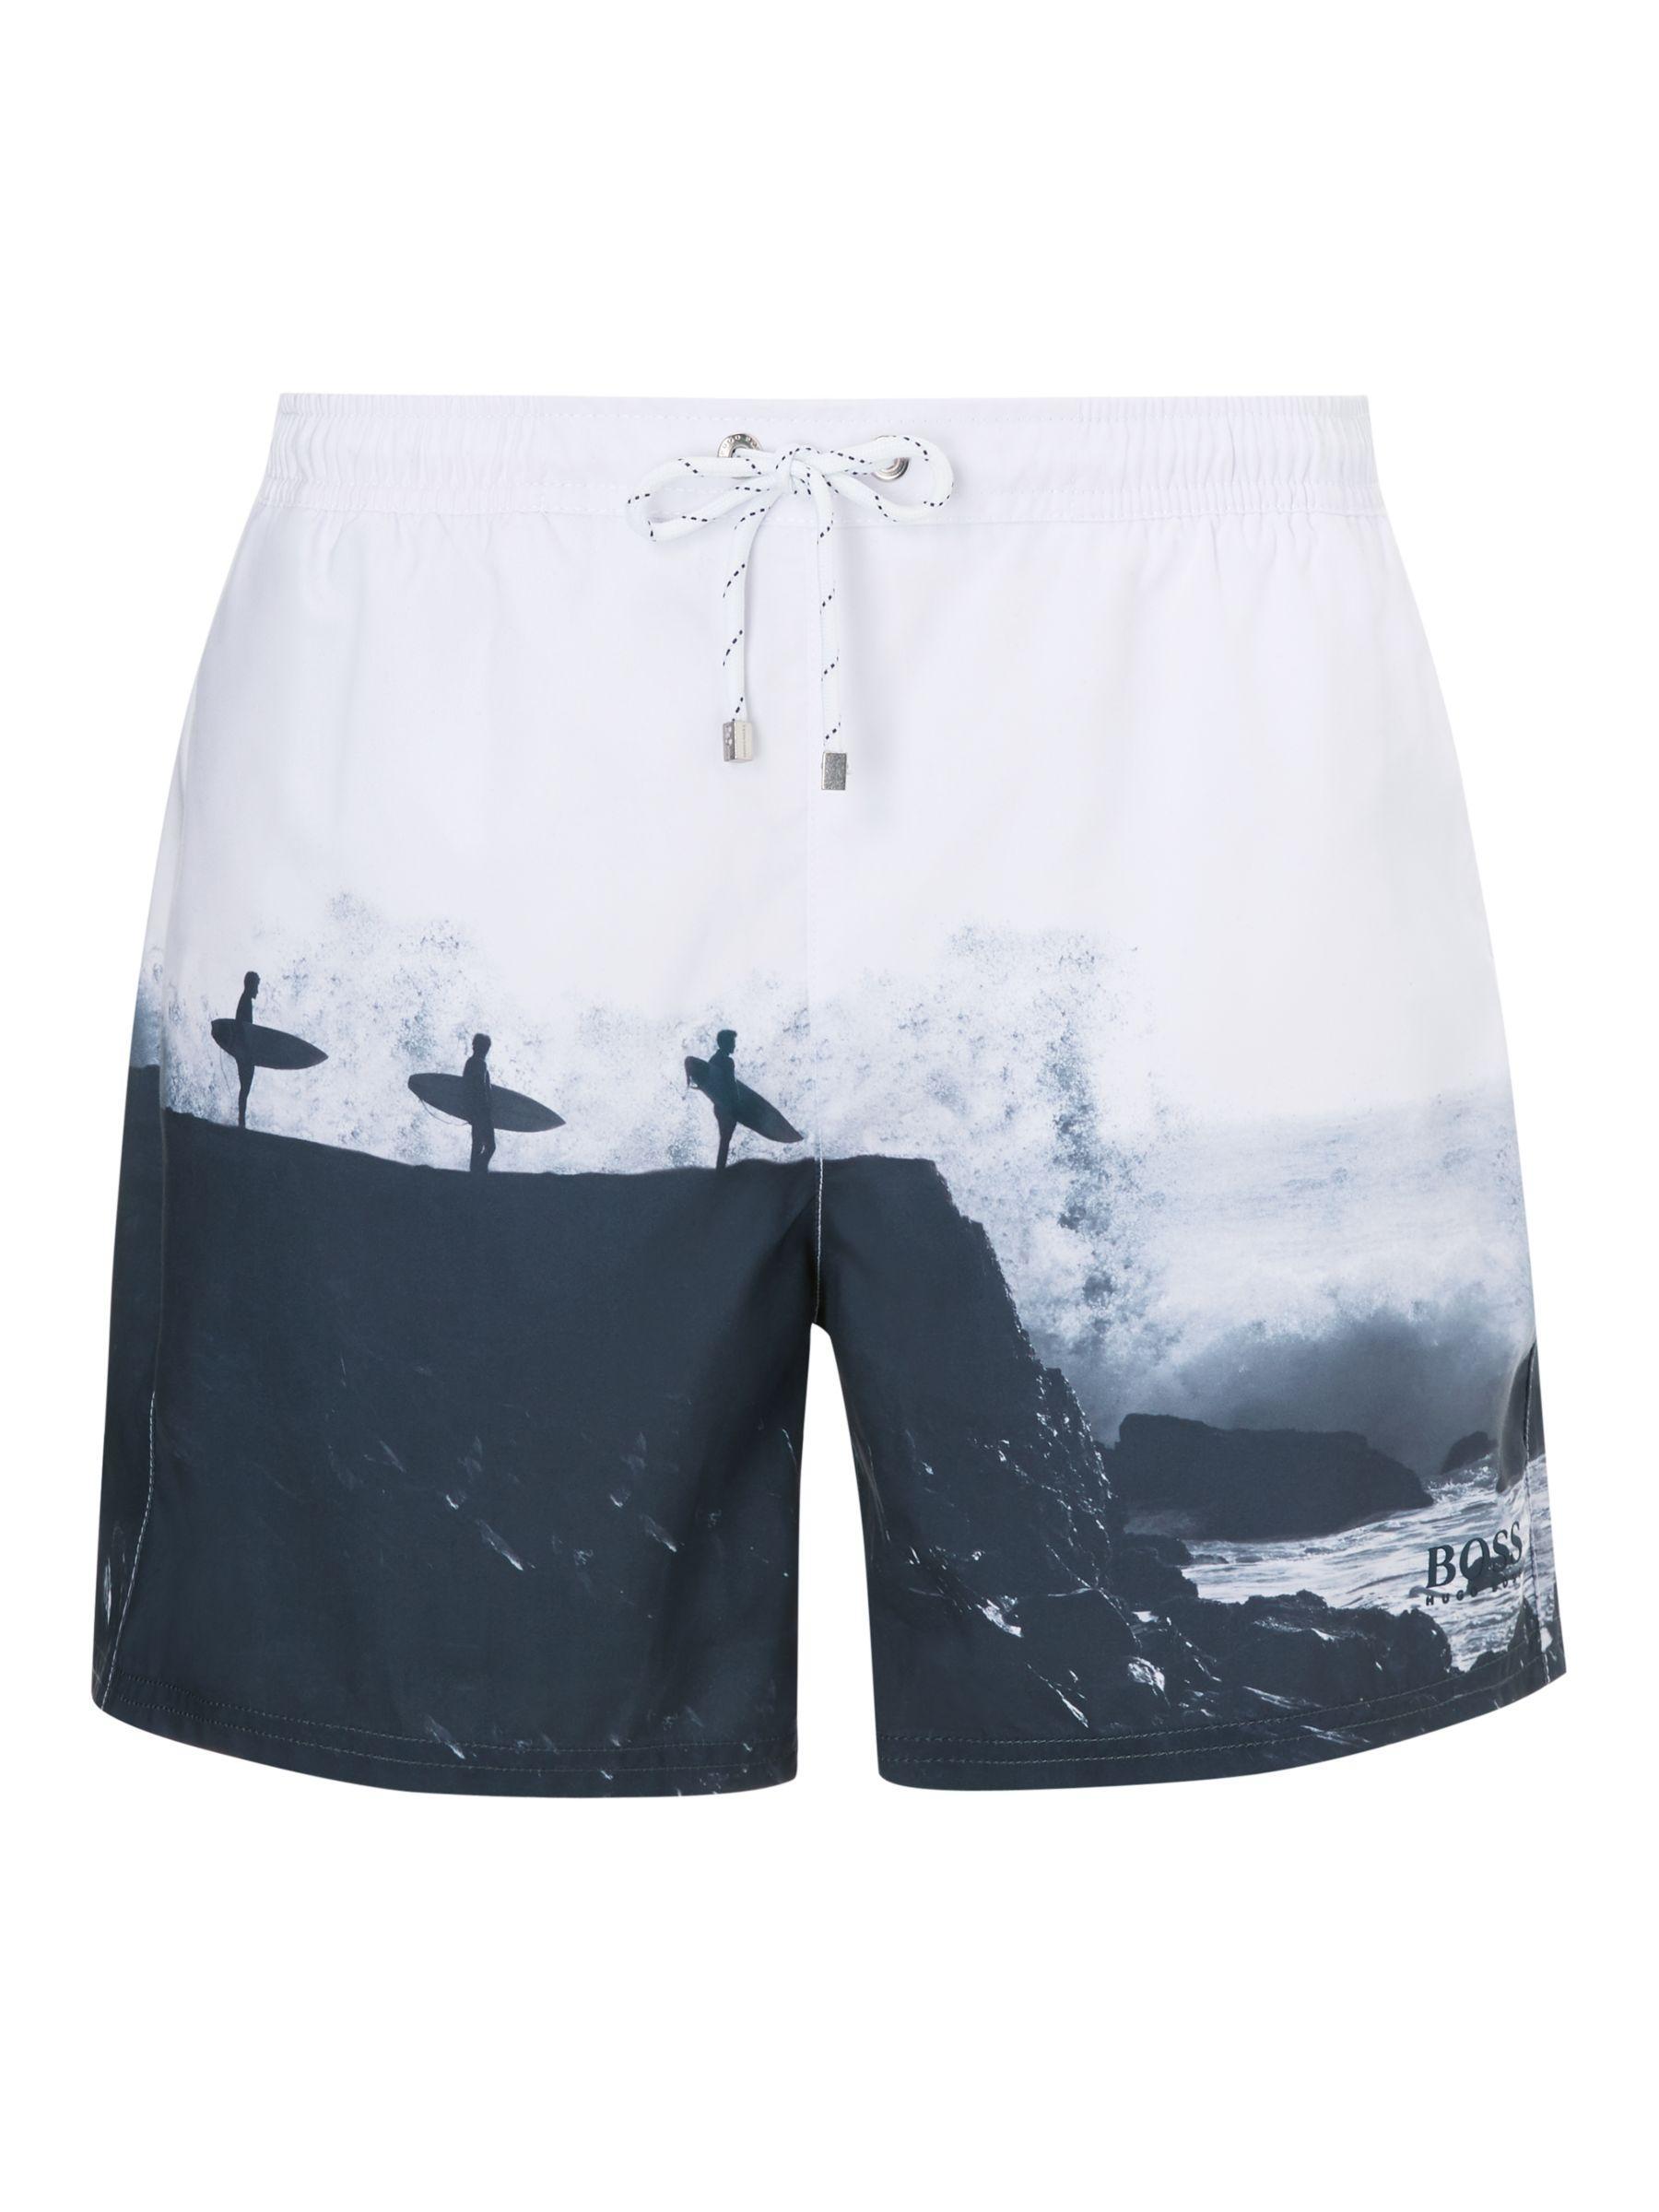 6df37d65b4 BOSS Surfer Photo Swim Shorts in Blue for Men - Lyst